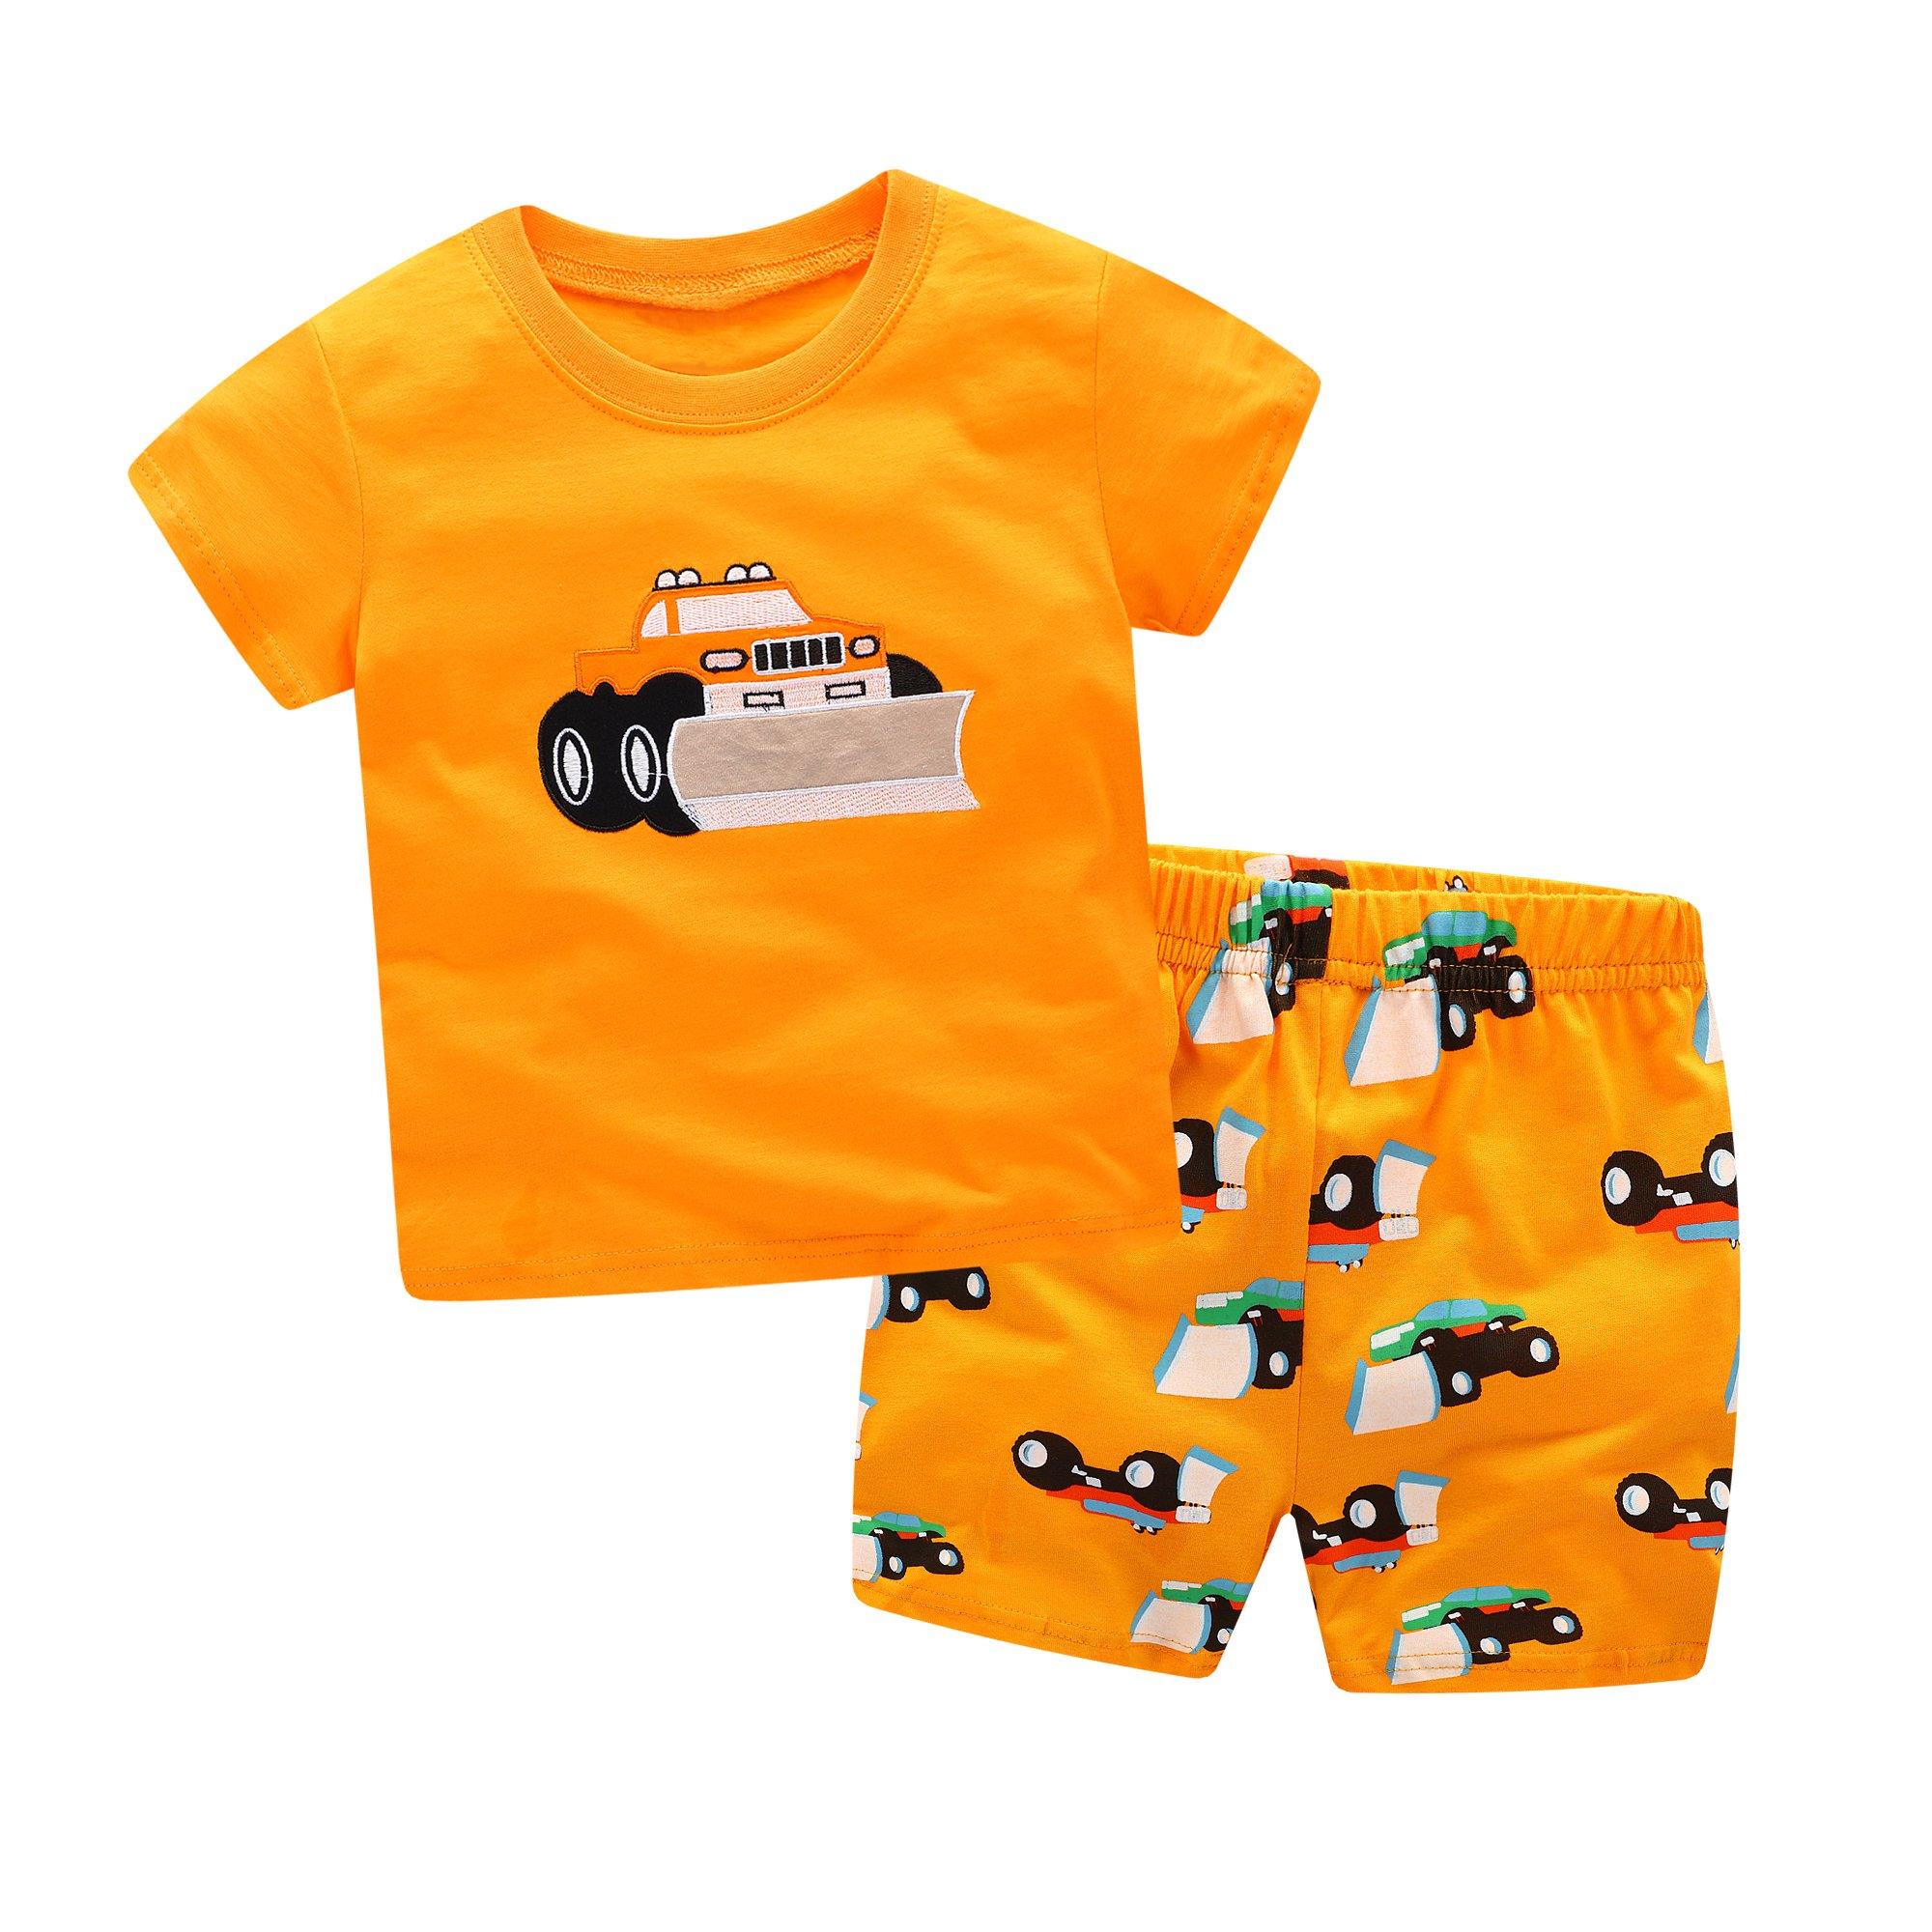 Dreamaxhp Truck Sleepwear Little Boys Cotton Pajama Set T Shirt & Pant (Short Sets, 9T)